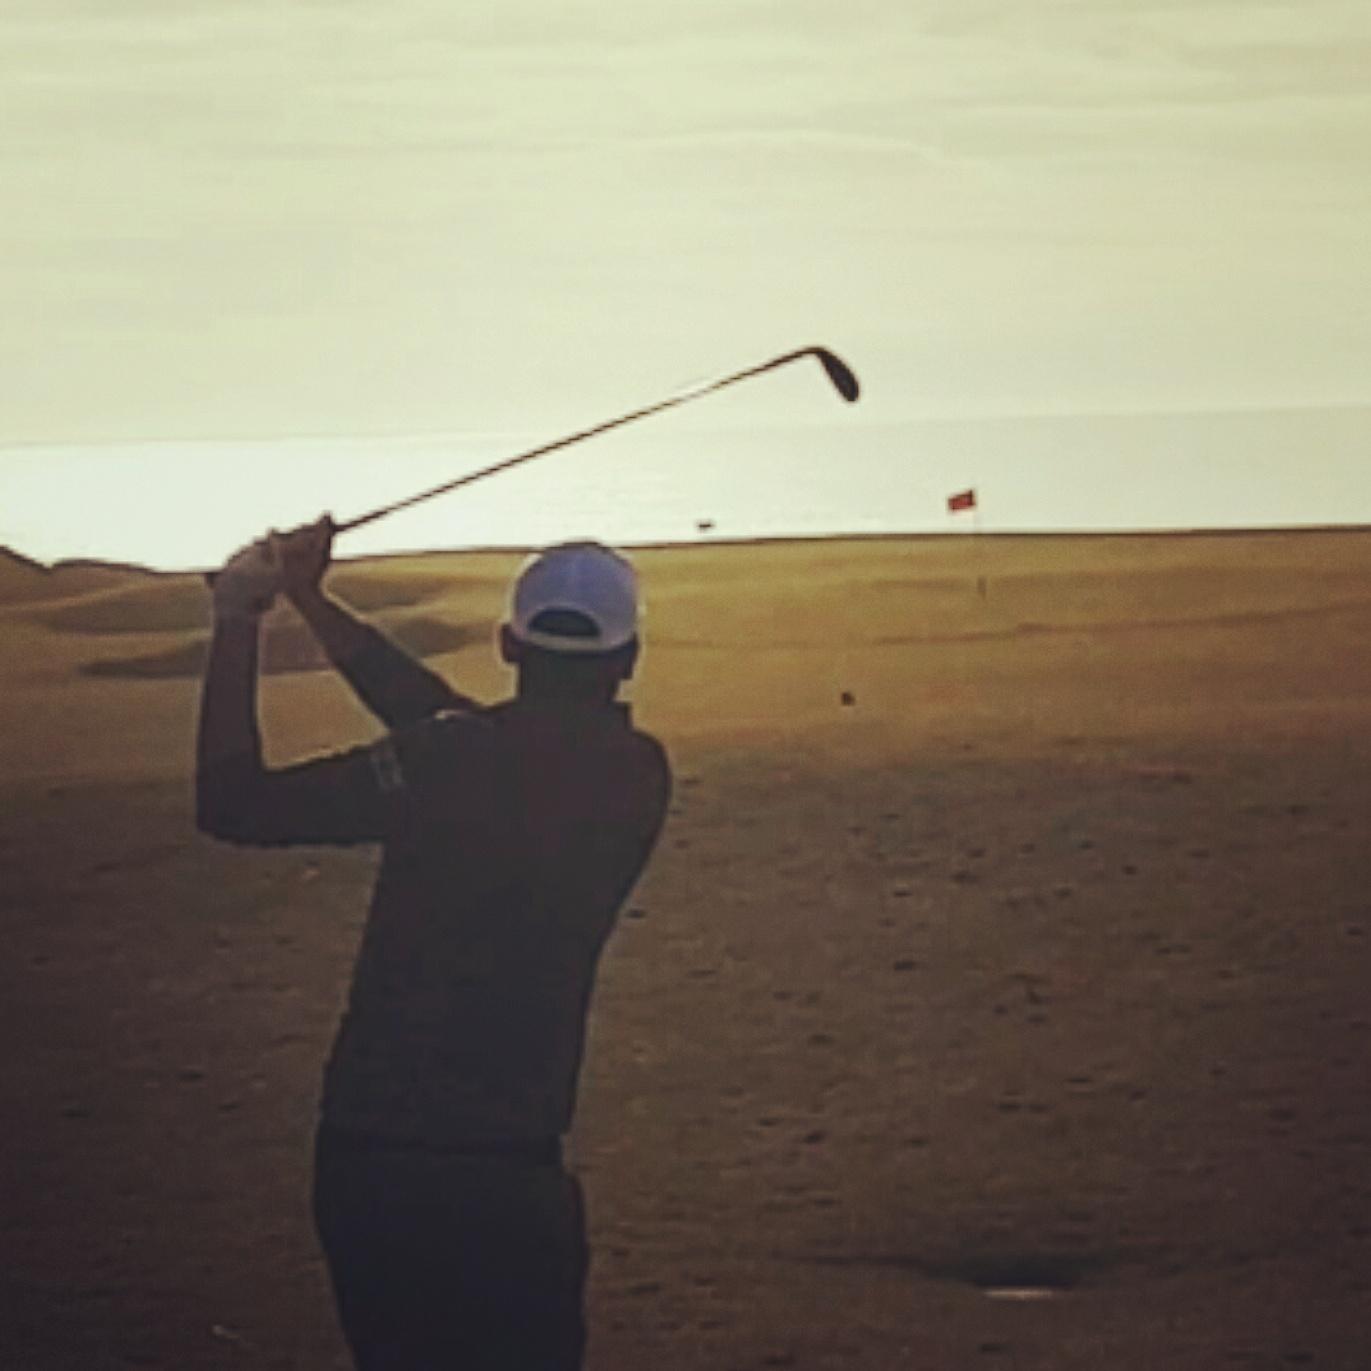 Avatar of golfer named Sean Gunn